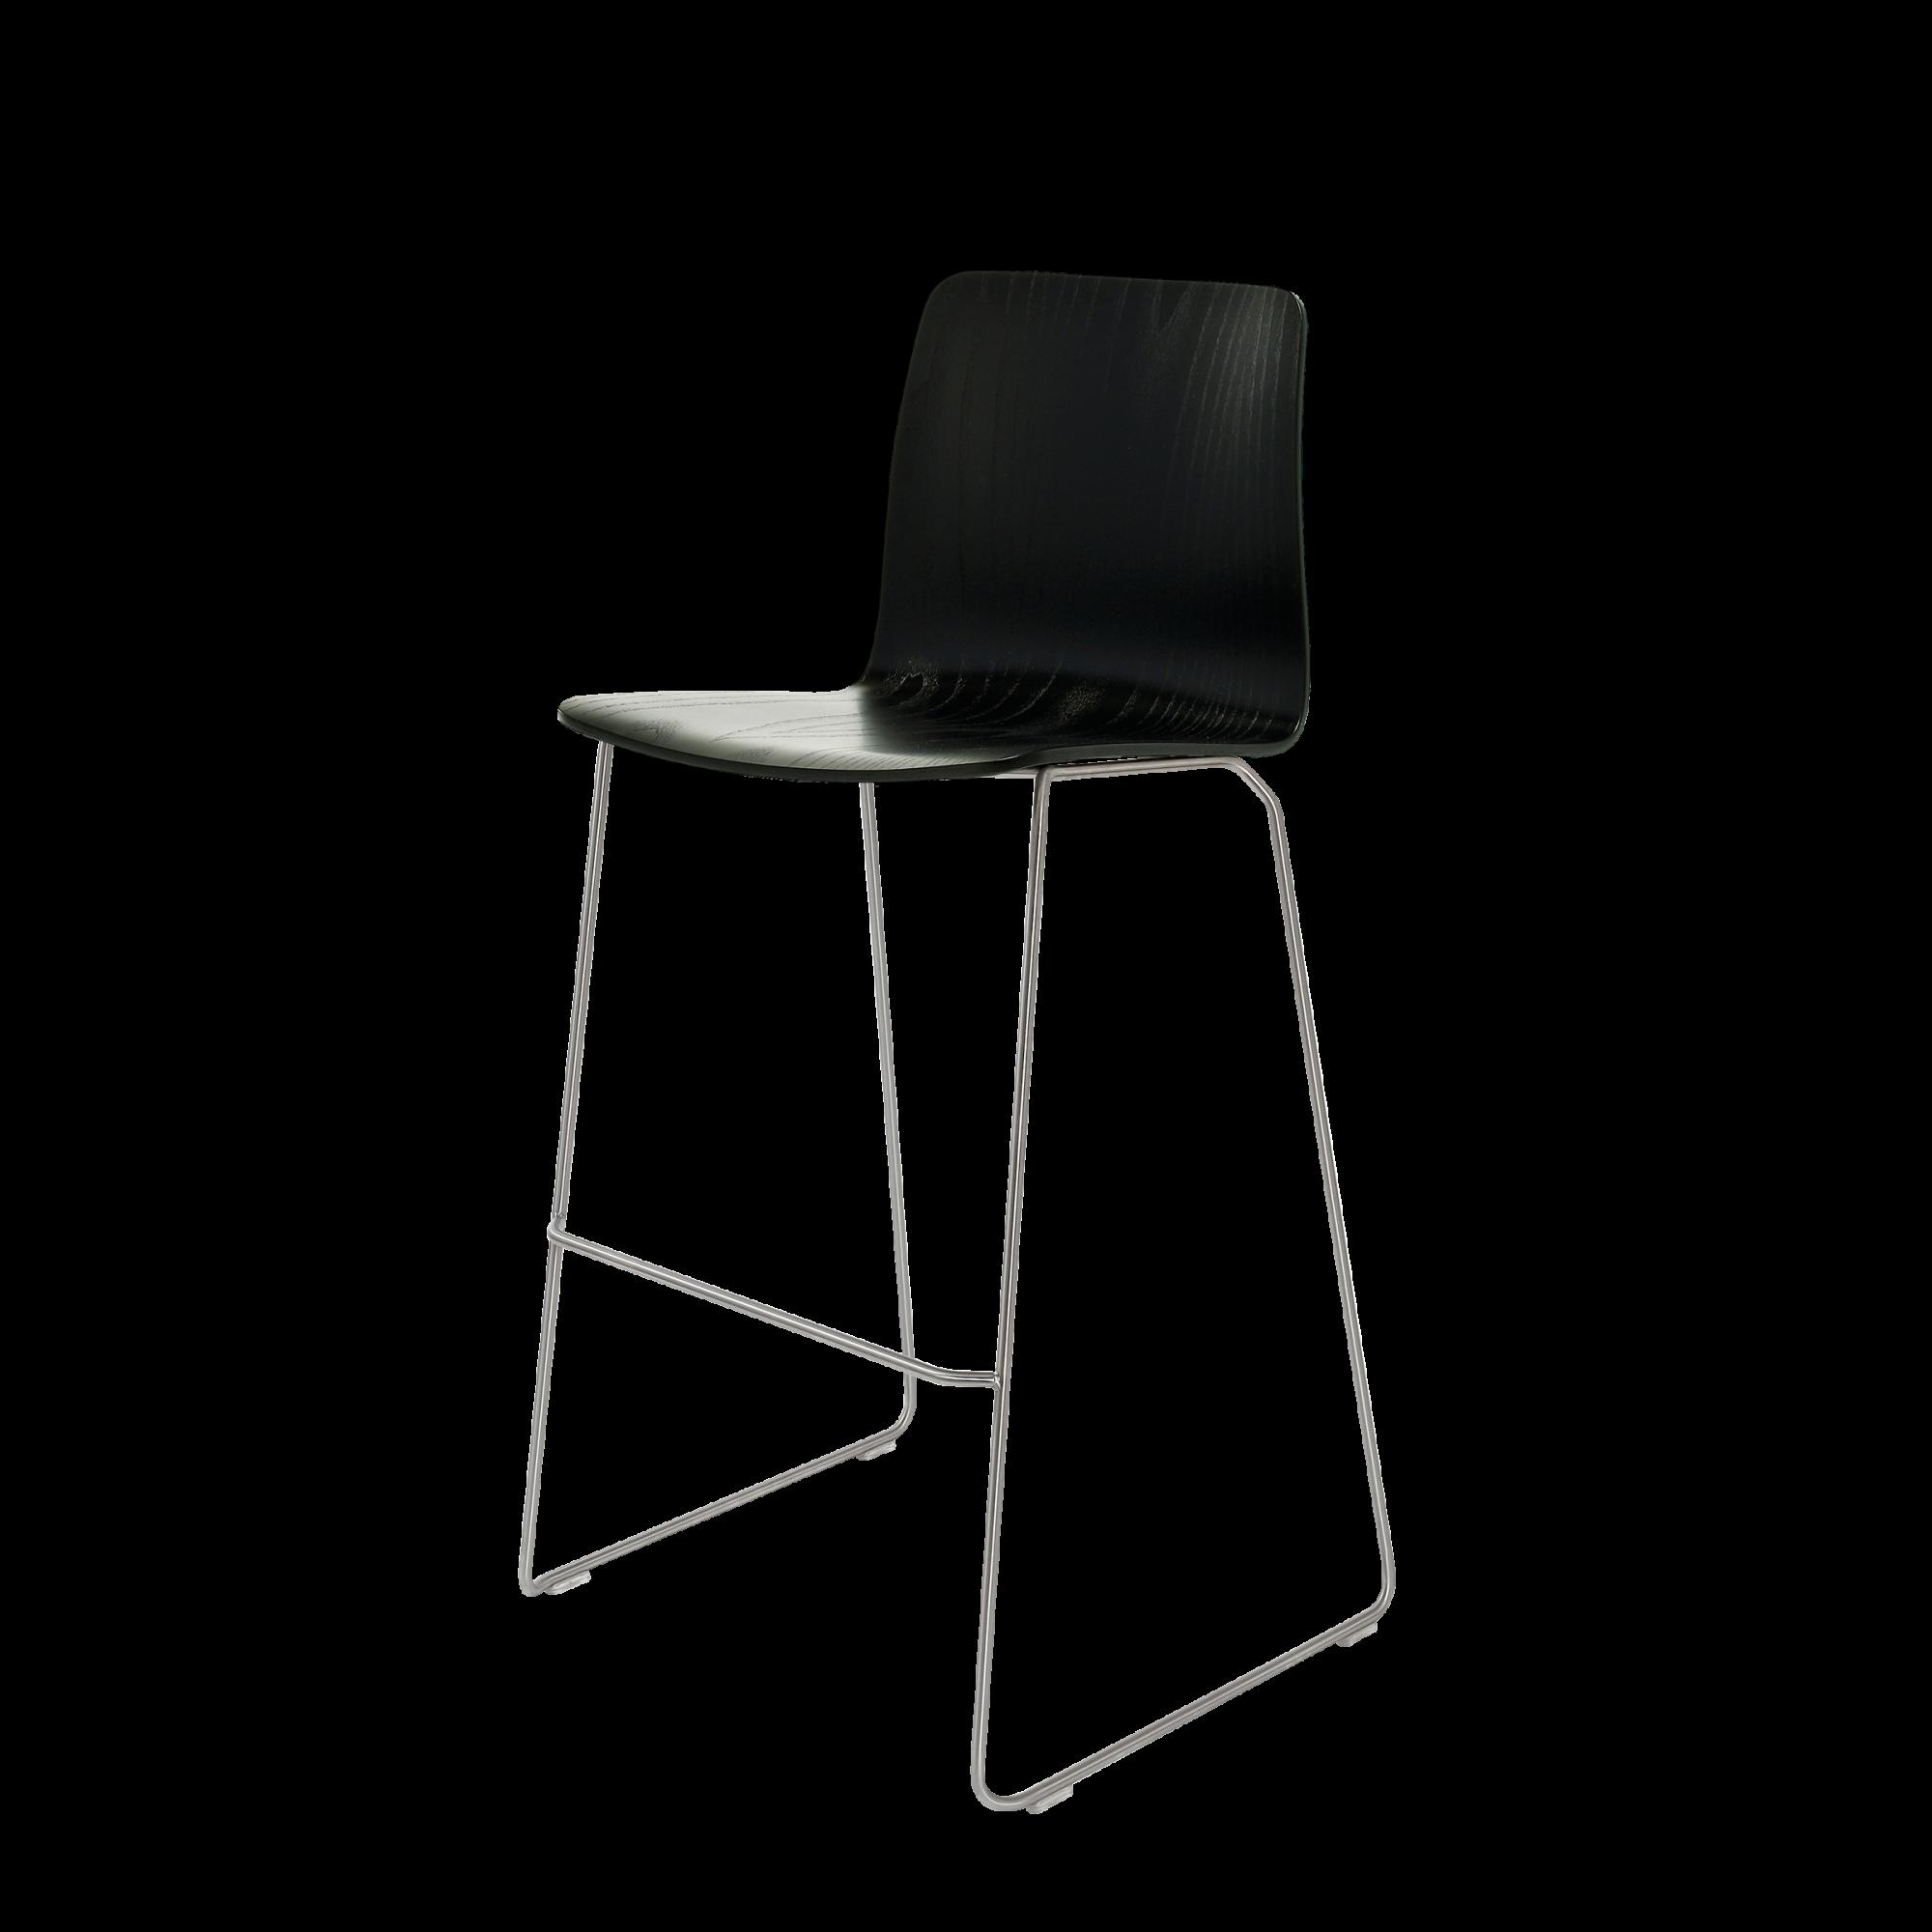 JW01 Bar stool Grey Black Buy online : 9481JW01 Bar stool Grey Black from home.idiliq.com size 2000 x 2000 png 631kB